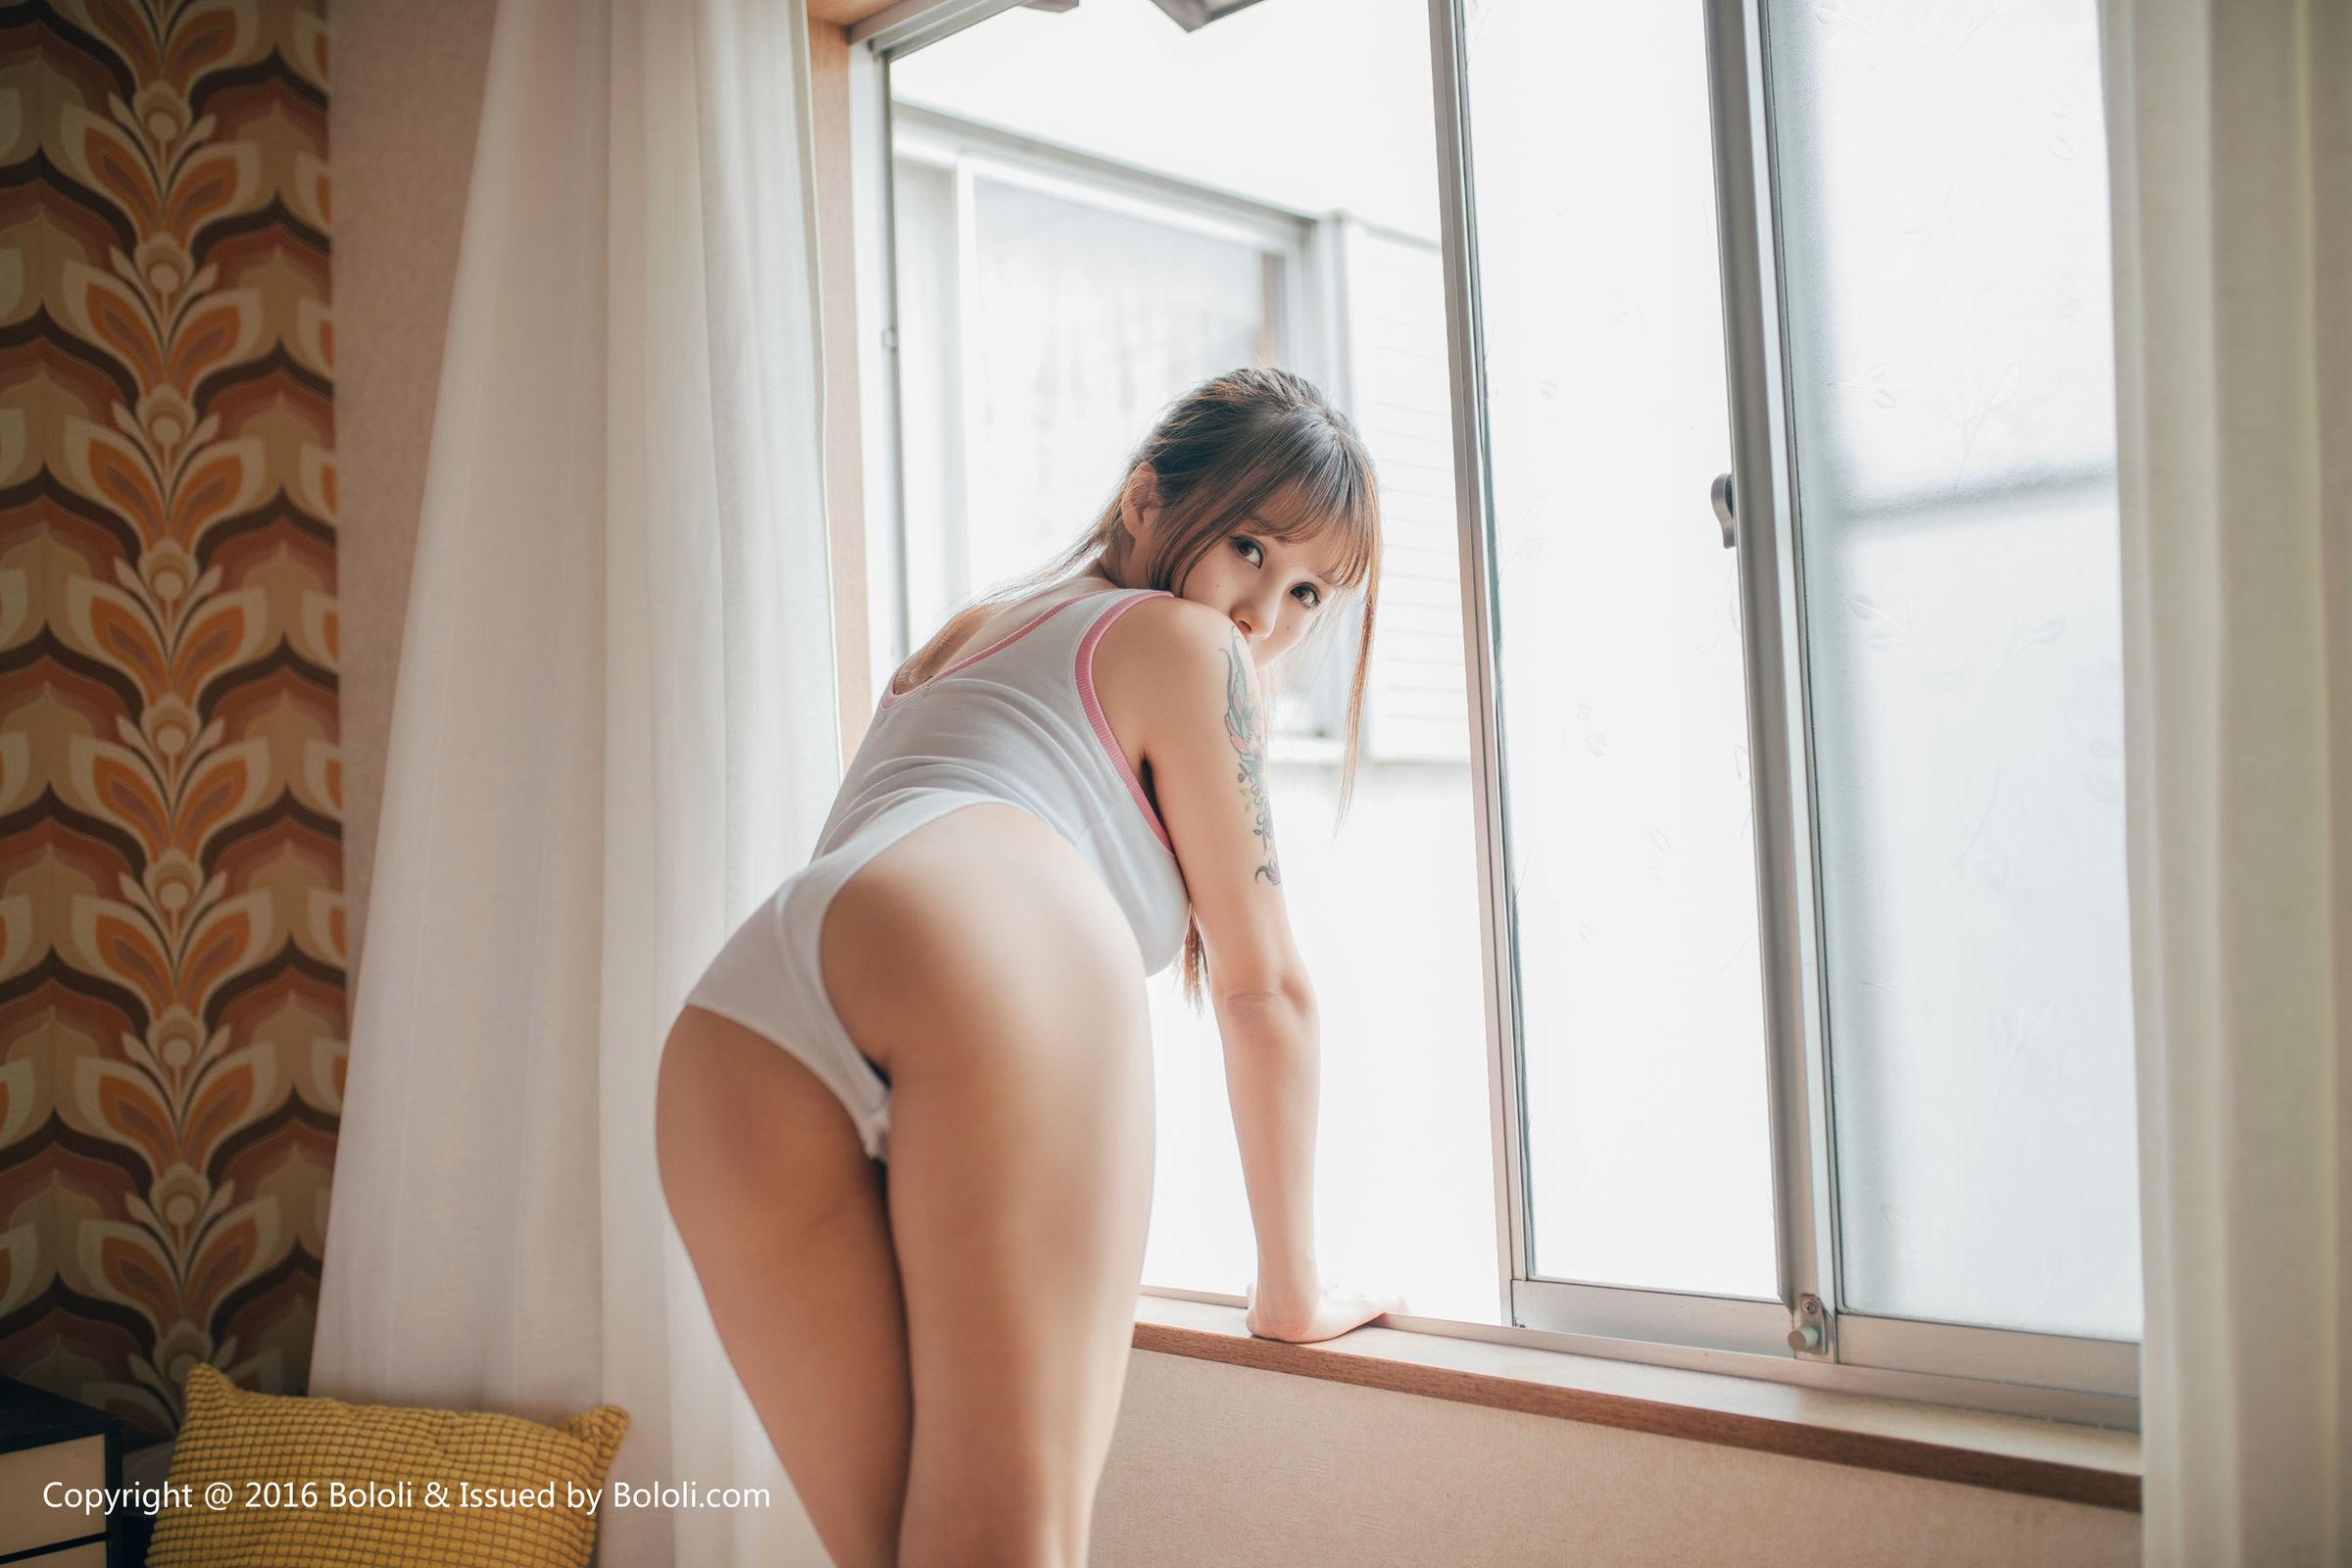 [Bololi波萝社] BOL.099 夏美酱 - 夏美的可爱性感[57P]